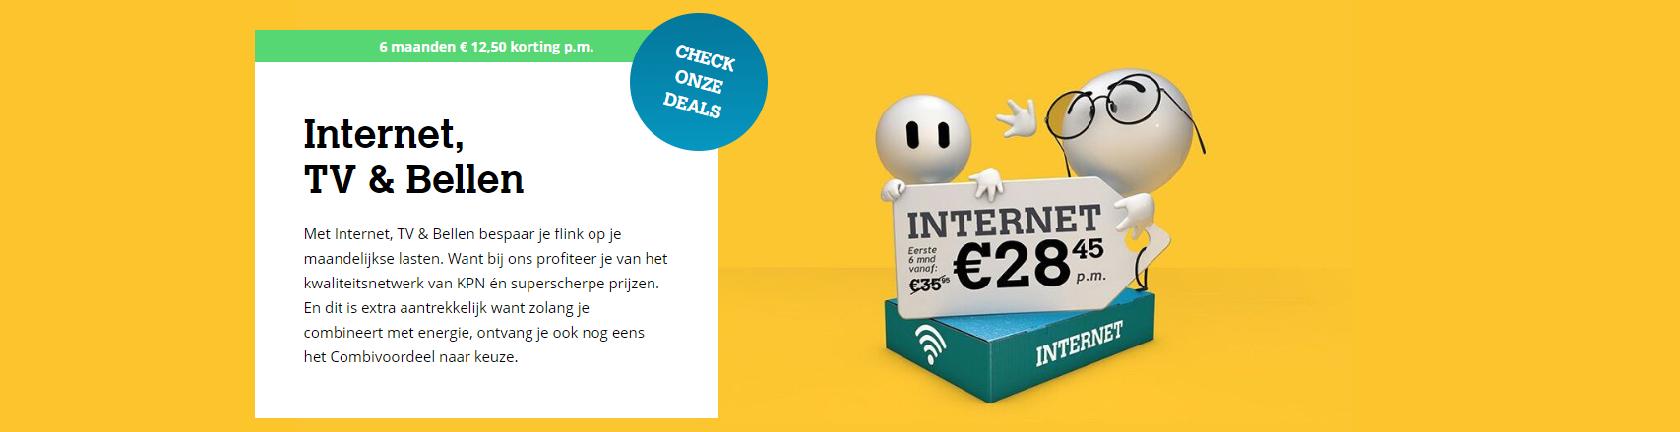 Internet, TV & Bellen uitleg gele achtergrond 2 emoticons